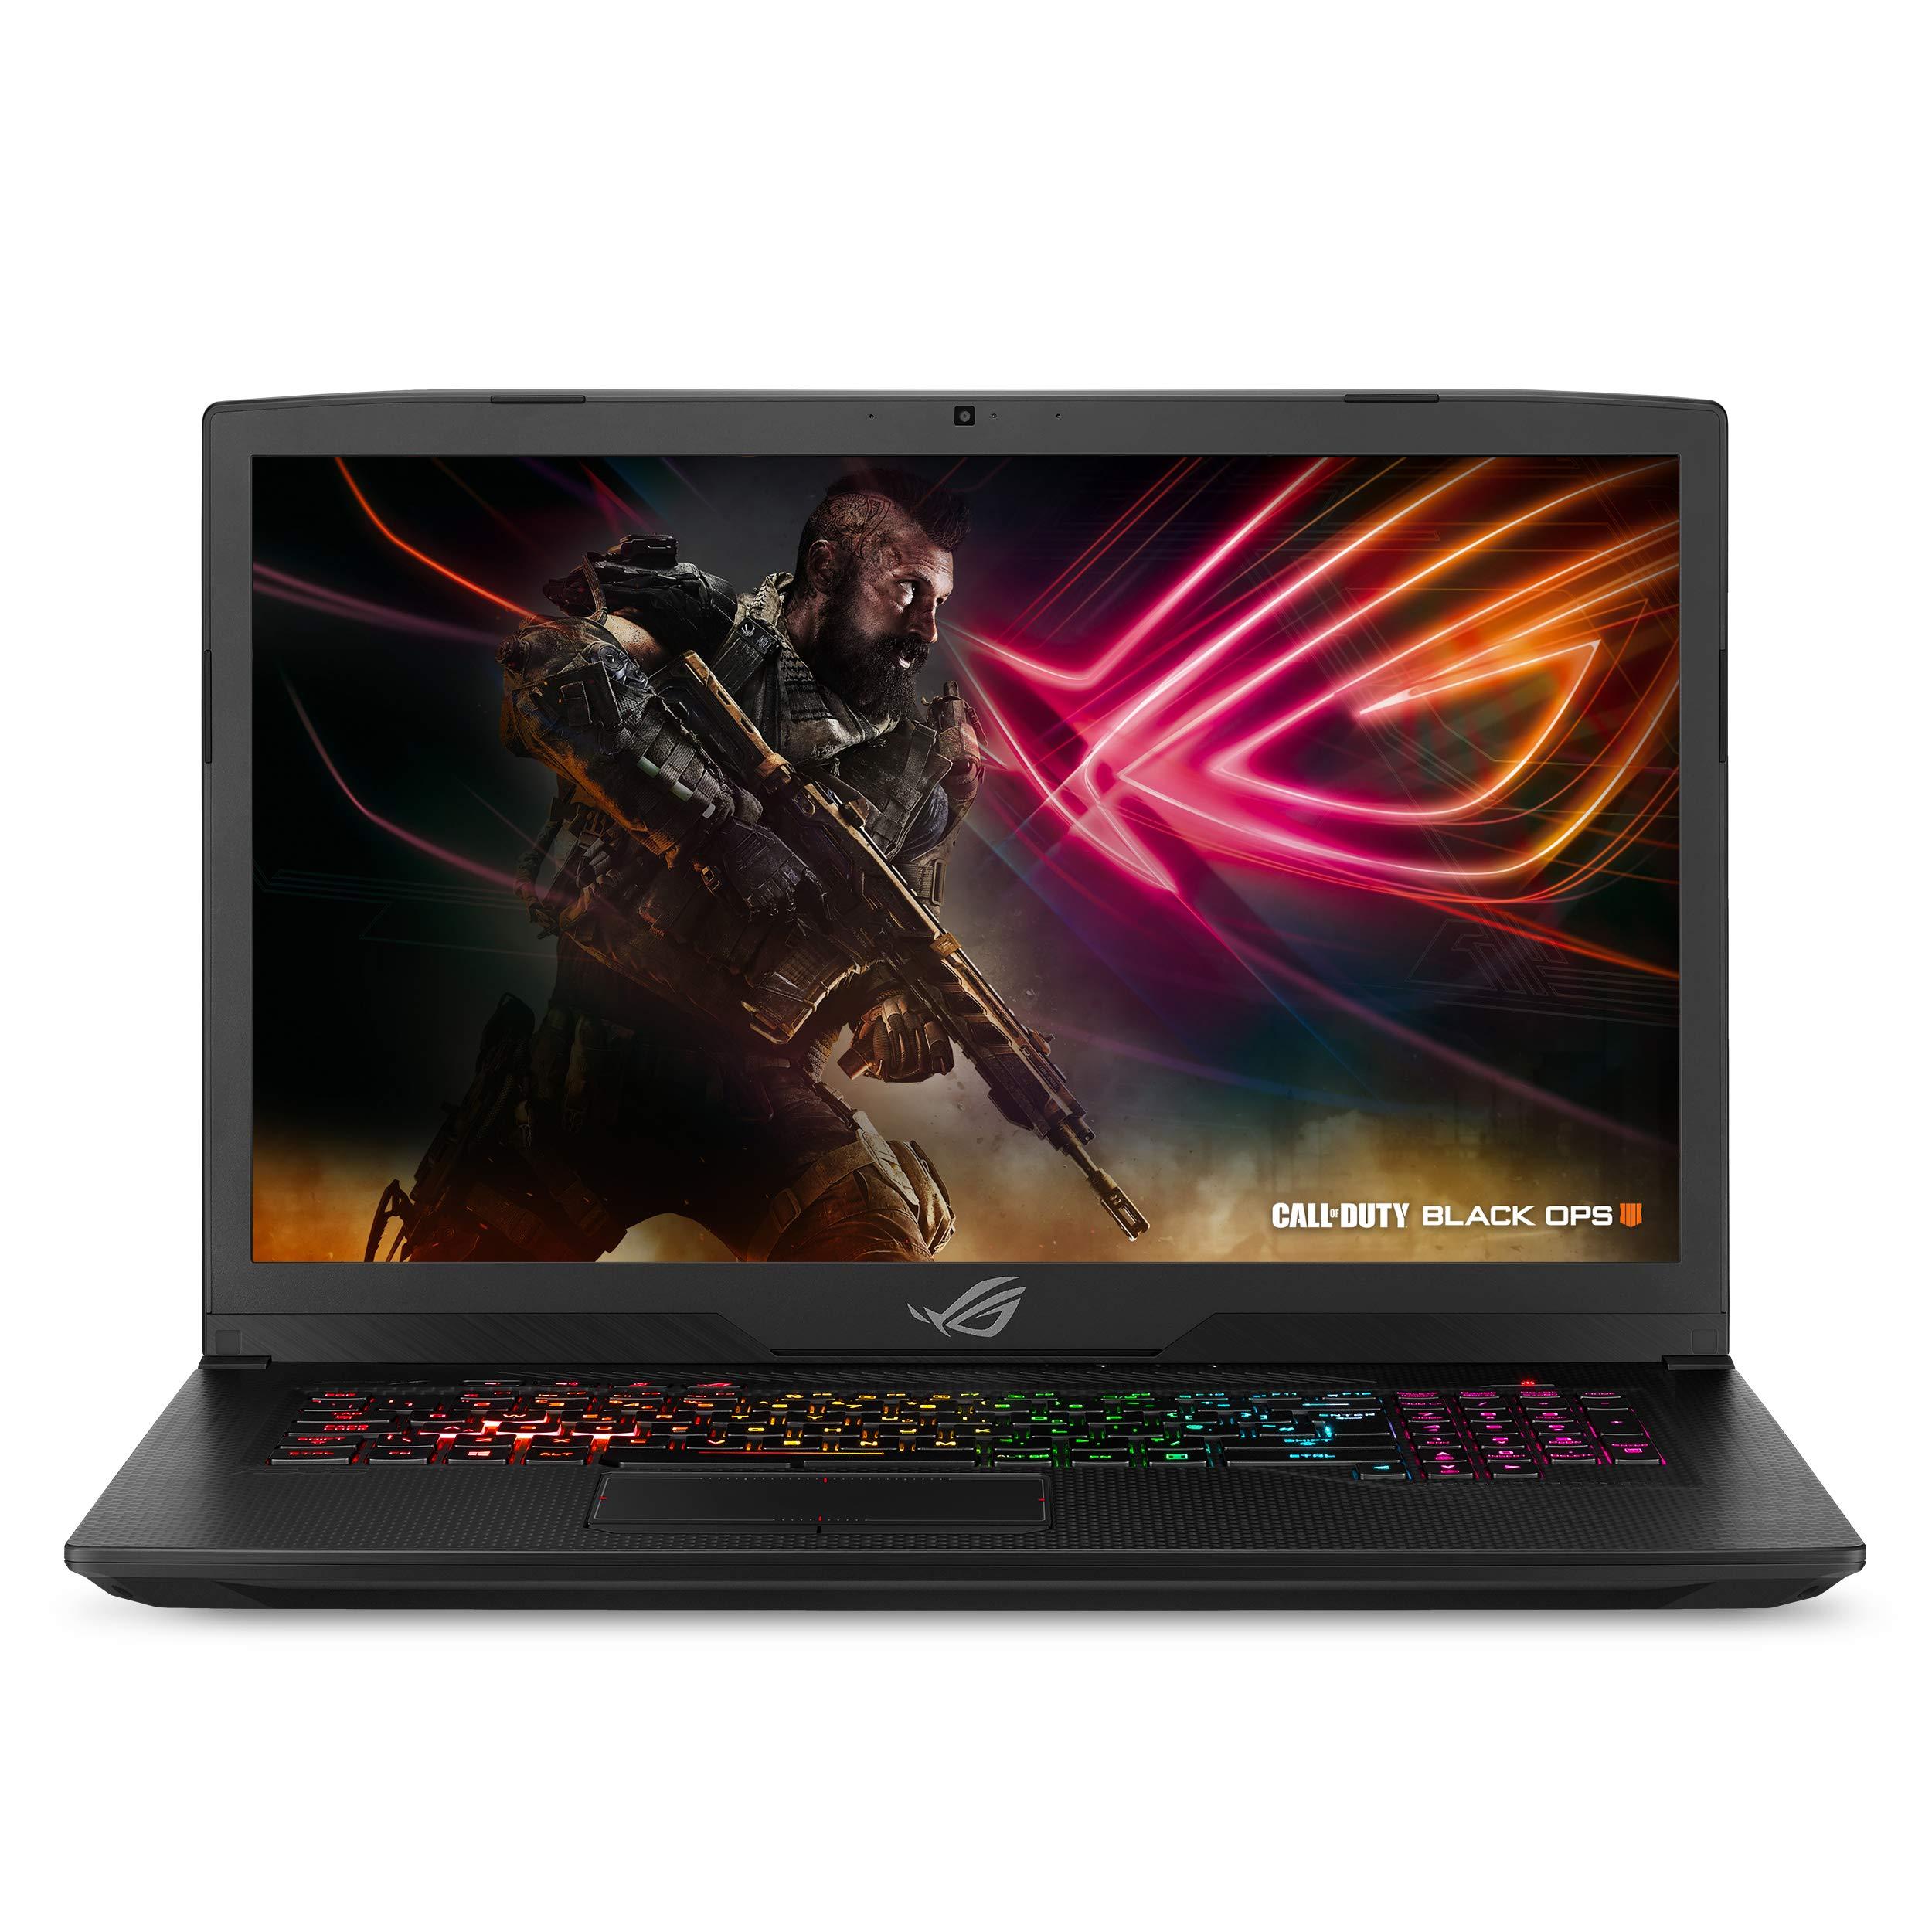 "ASUS ROG Strix Scar Edition Gaming Laptop, 17.3"" 120Hz 3ms Full HD, Intel Core i7-8750H Processor, NVIDIA GeForce GTX 1060 6GB, 16GB DDR4, 256GB PCIe SSD + 1TB FireCuda, Windows 10 - GL703GM-DS74"